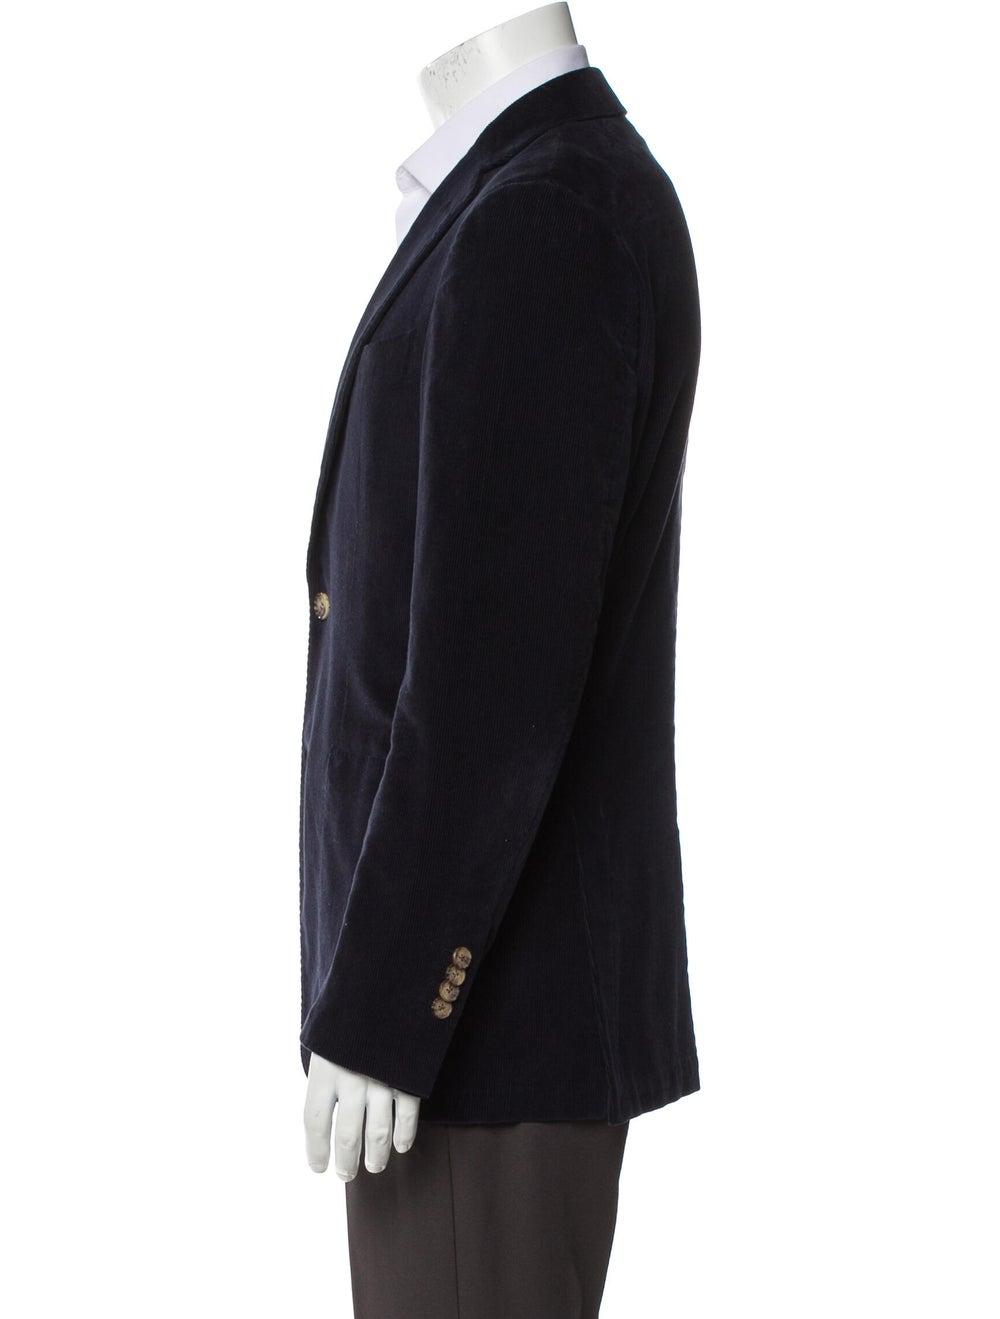 Suitsupply Sport Coat Blue - image 2